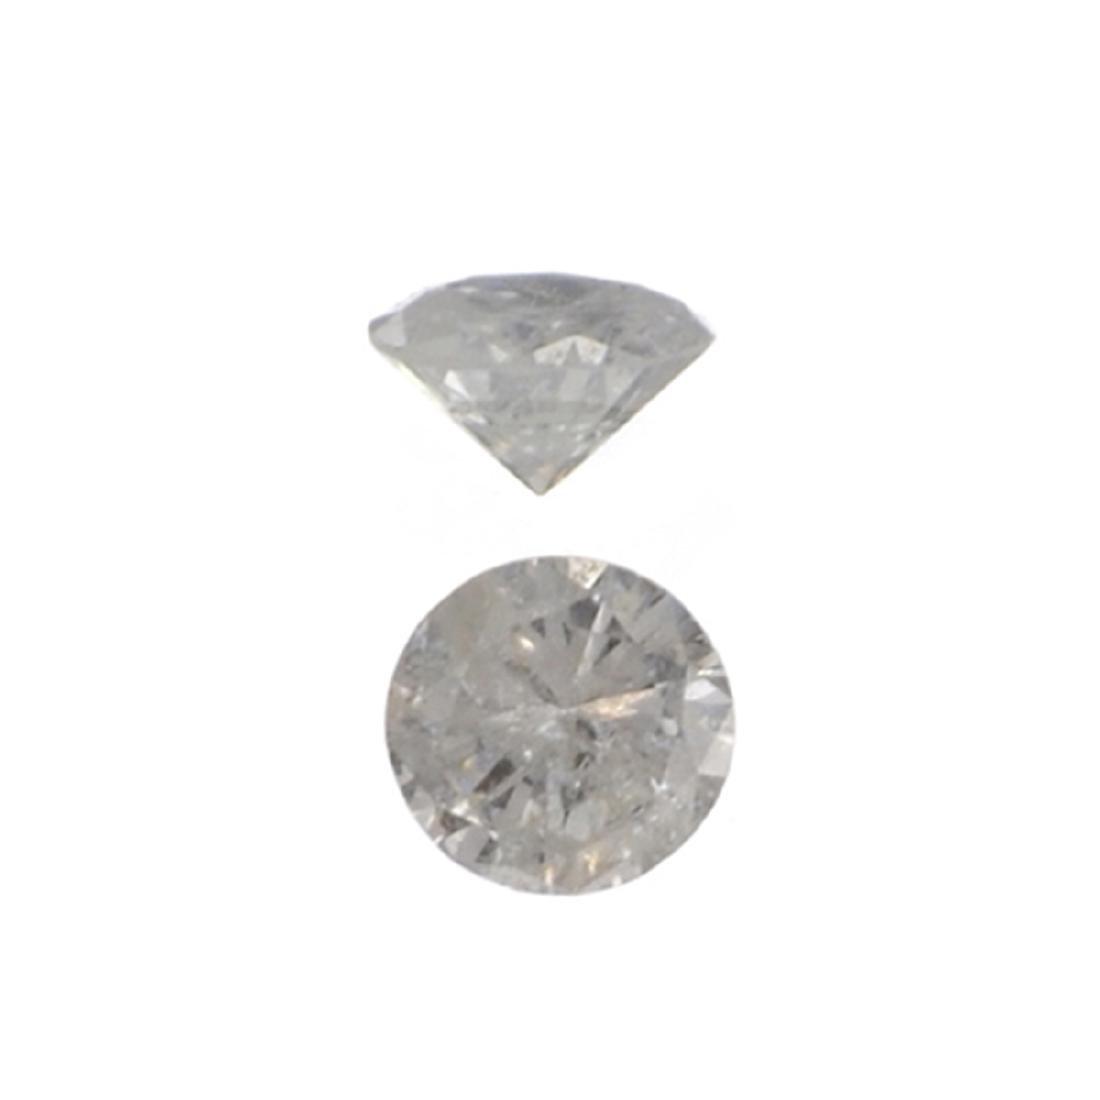 APP: 0.4k Fine Jewelry 0.15CT Round Brilliant Cut